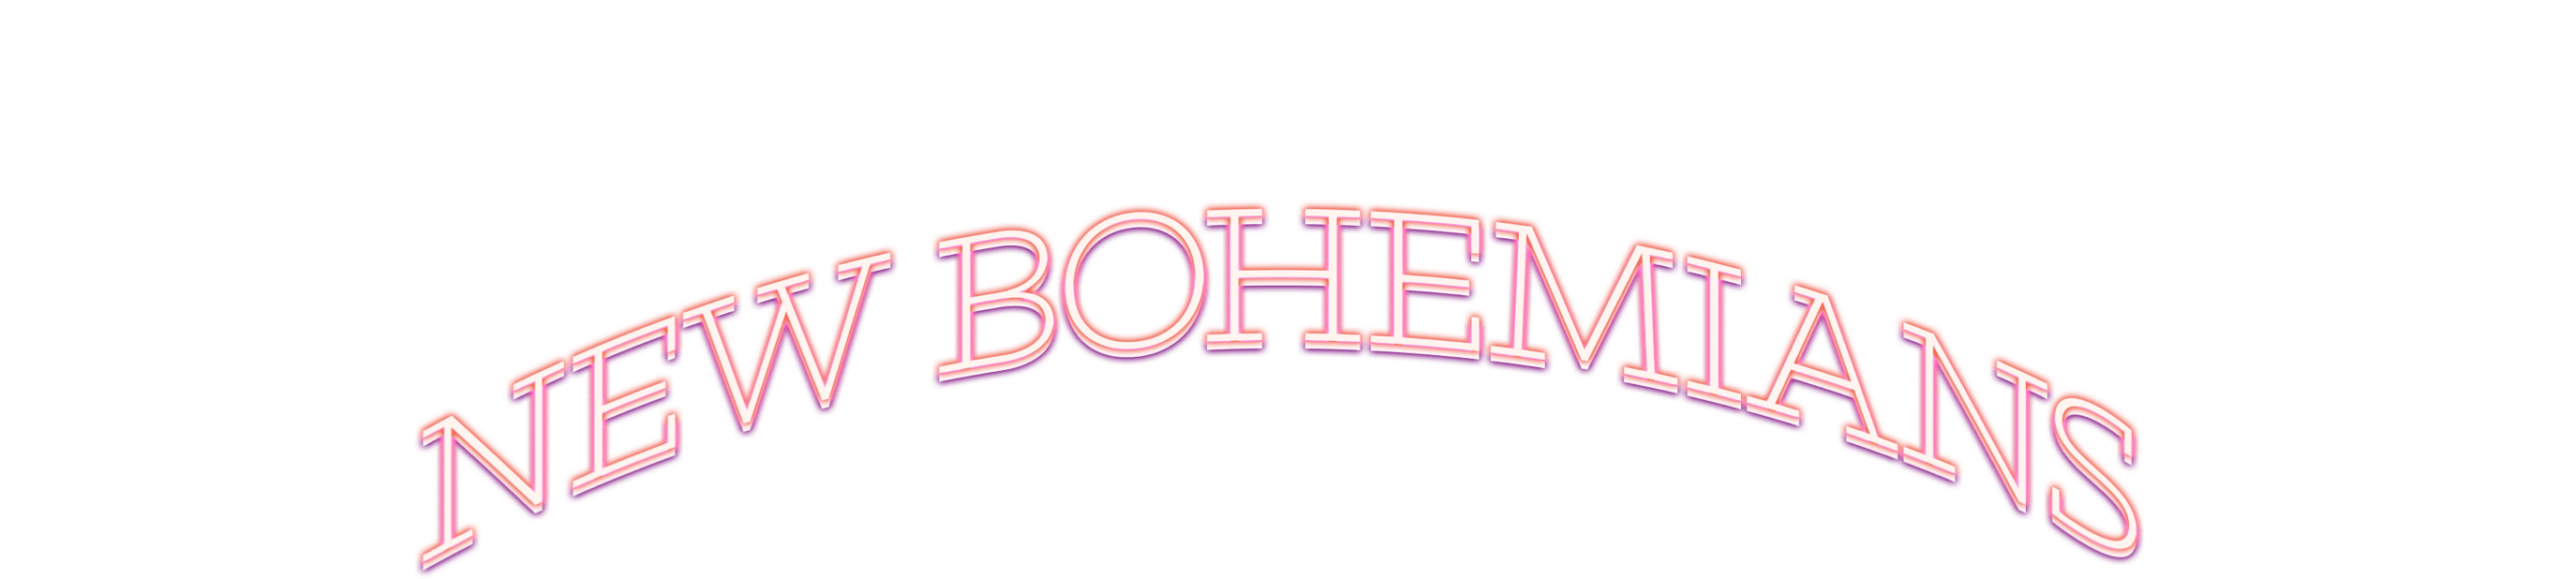 New Bohemians Logo c-min